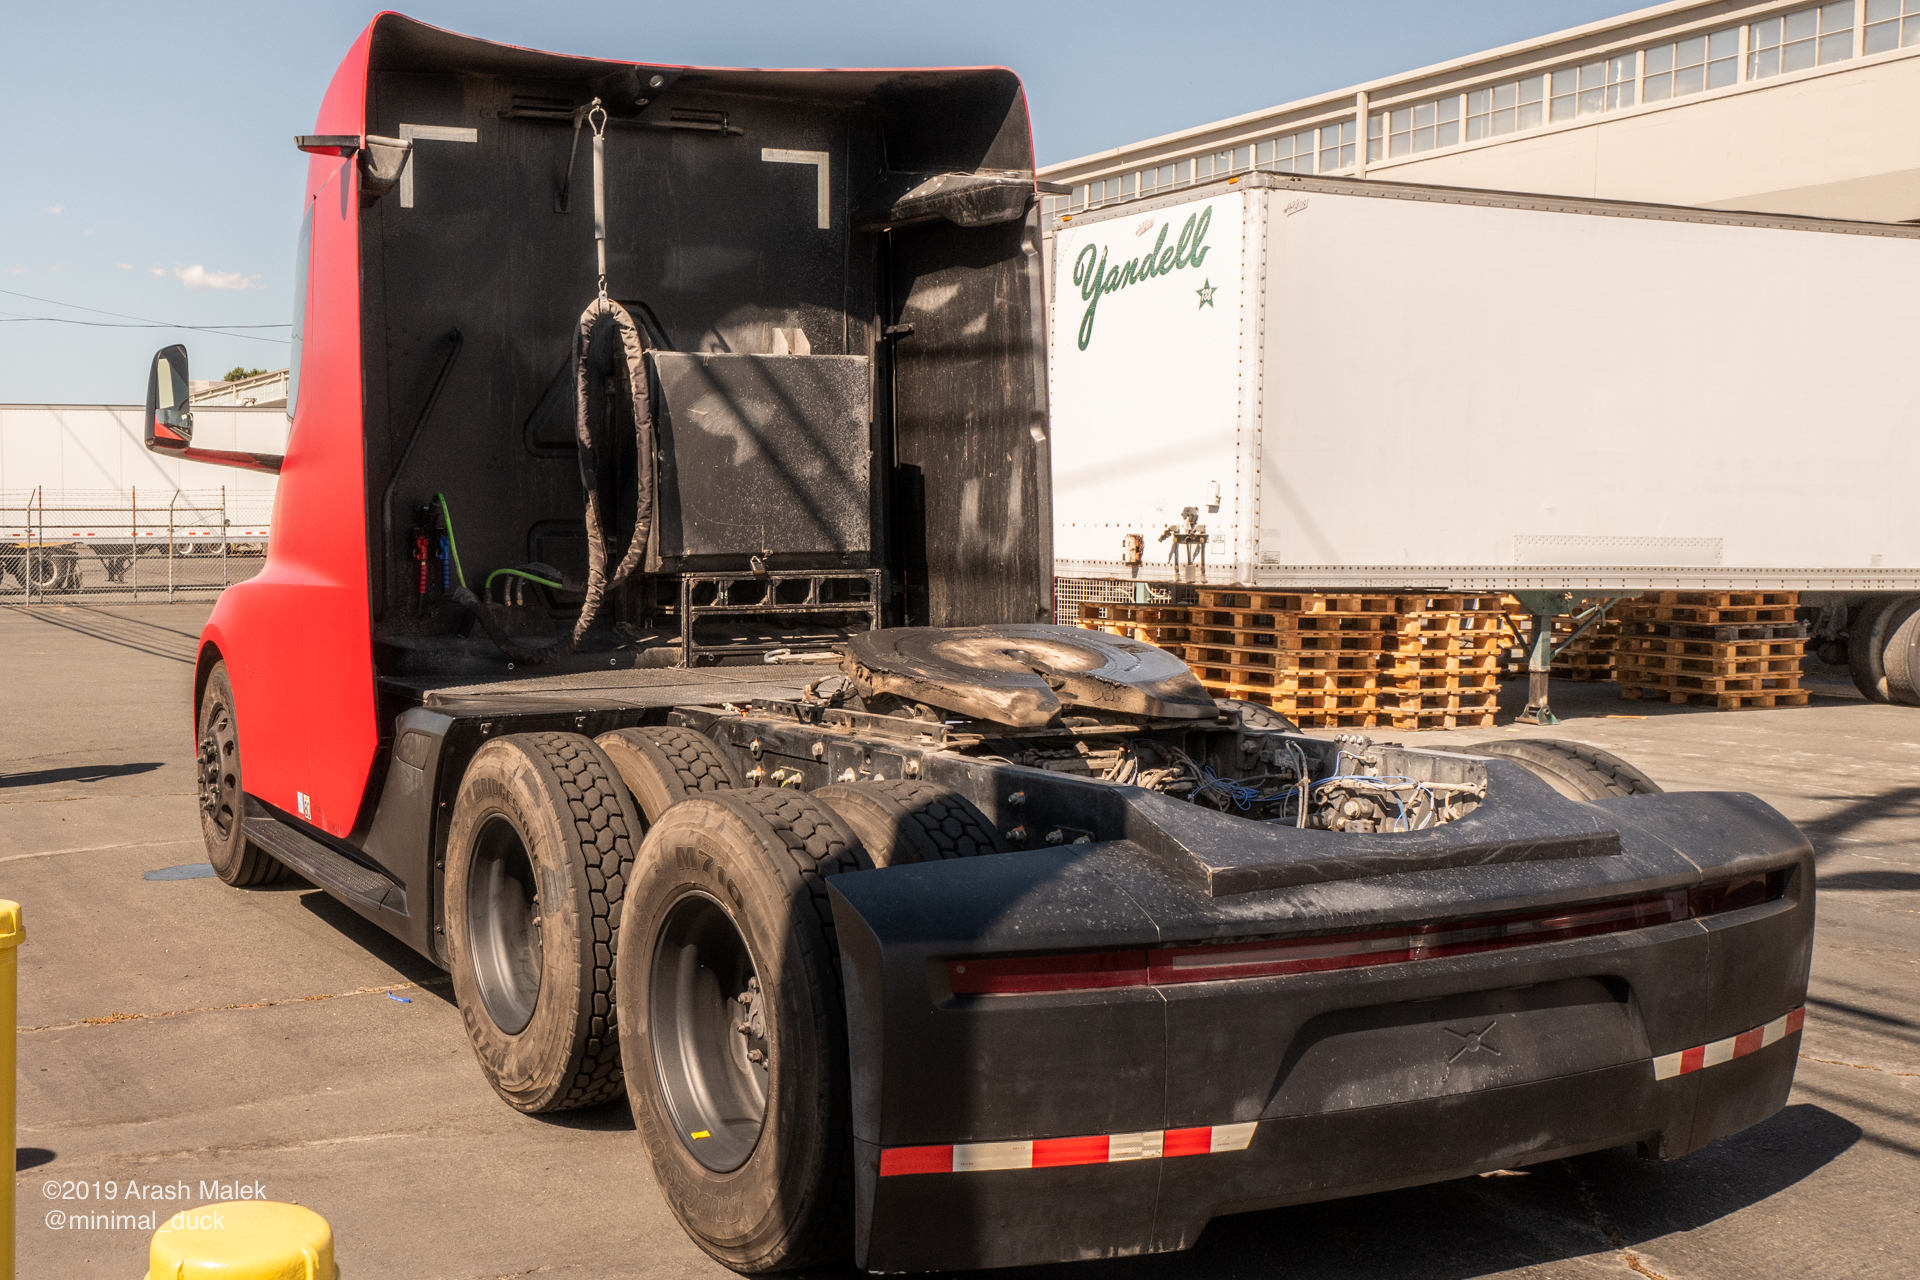 tesla-semi-yandell-truckaway-16